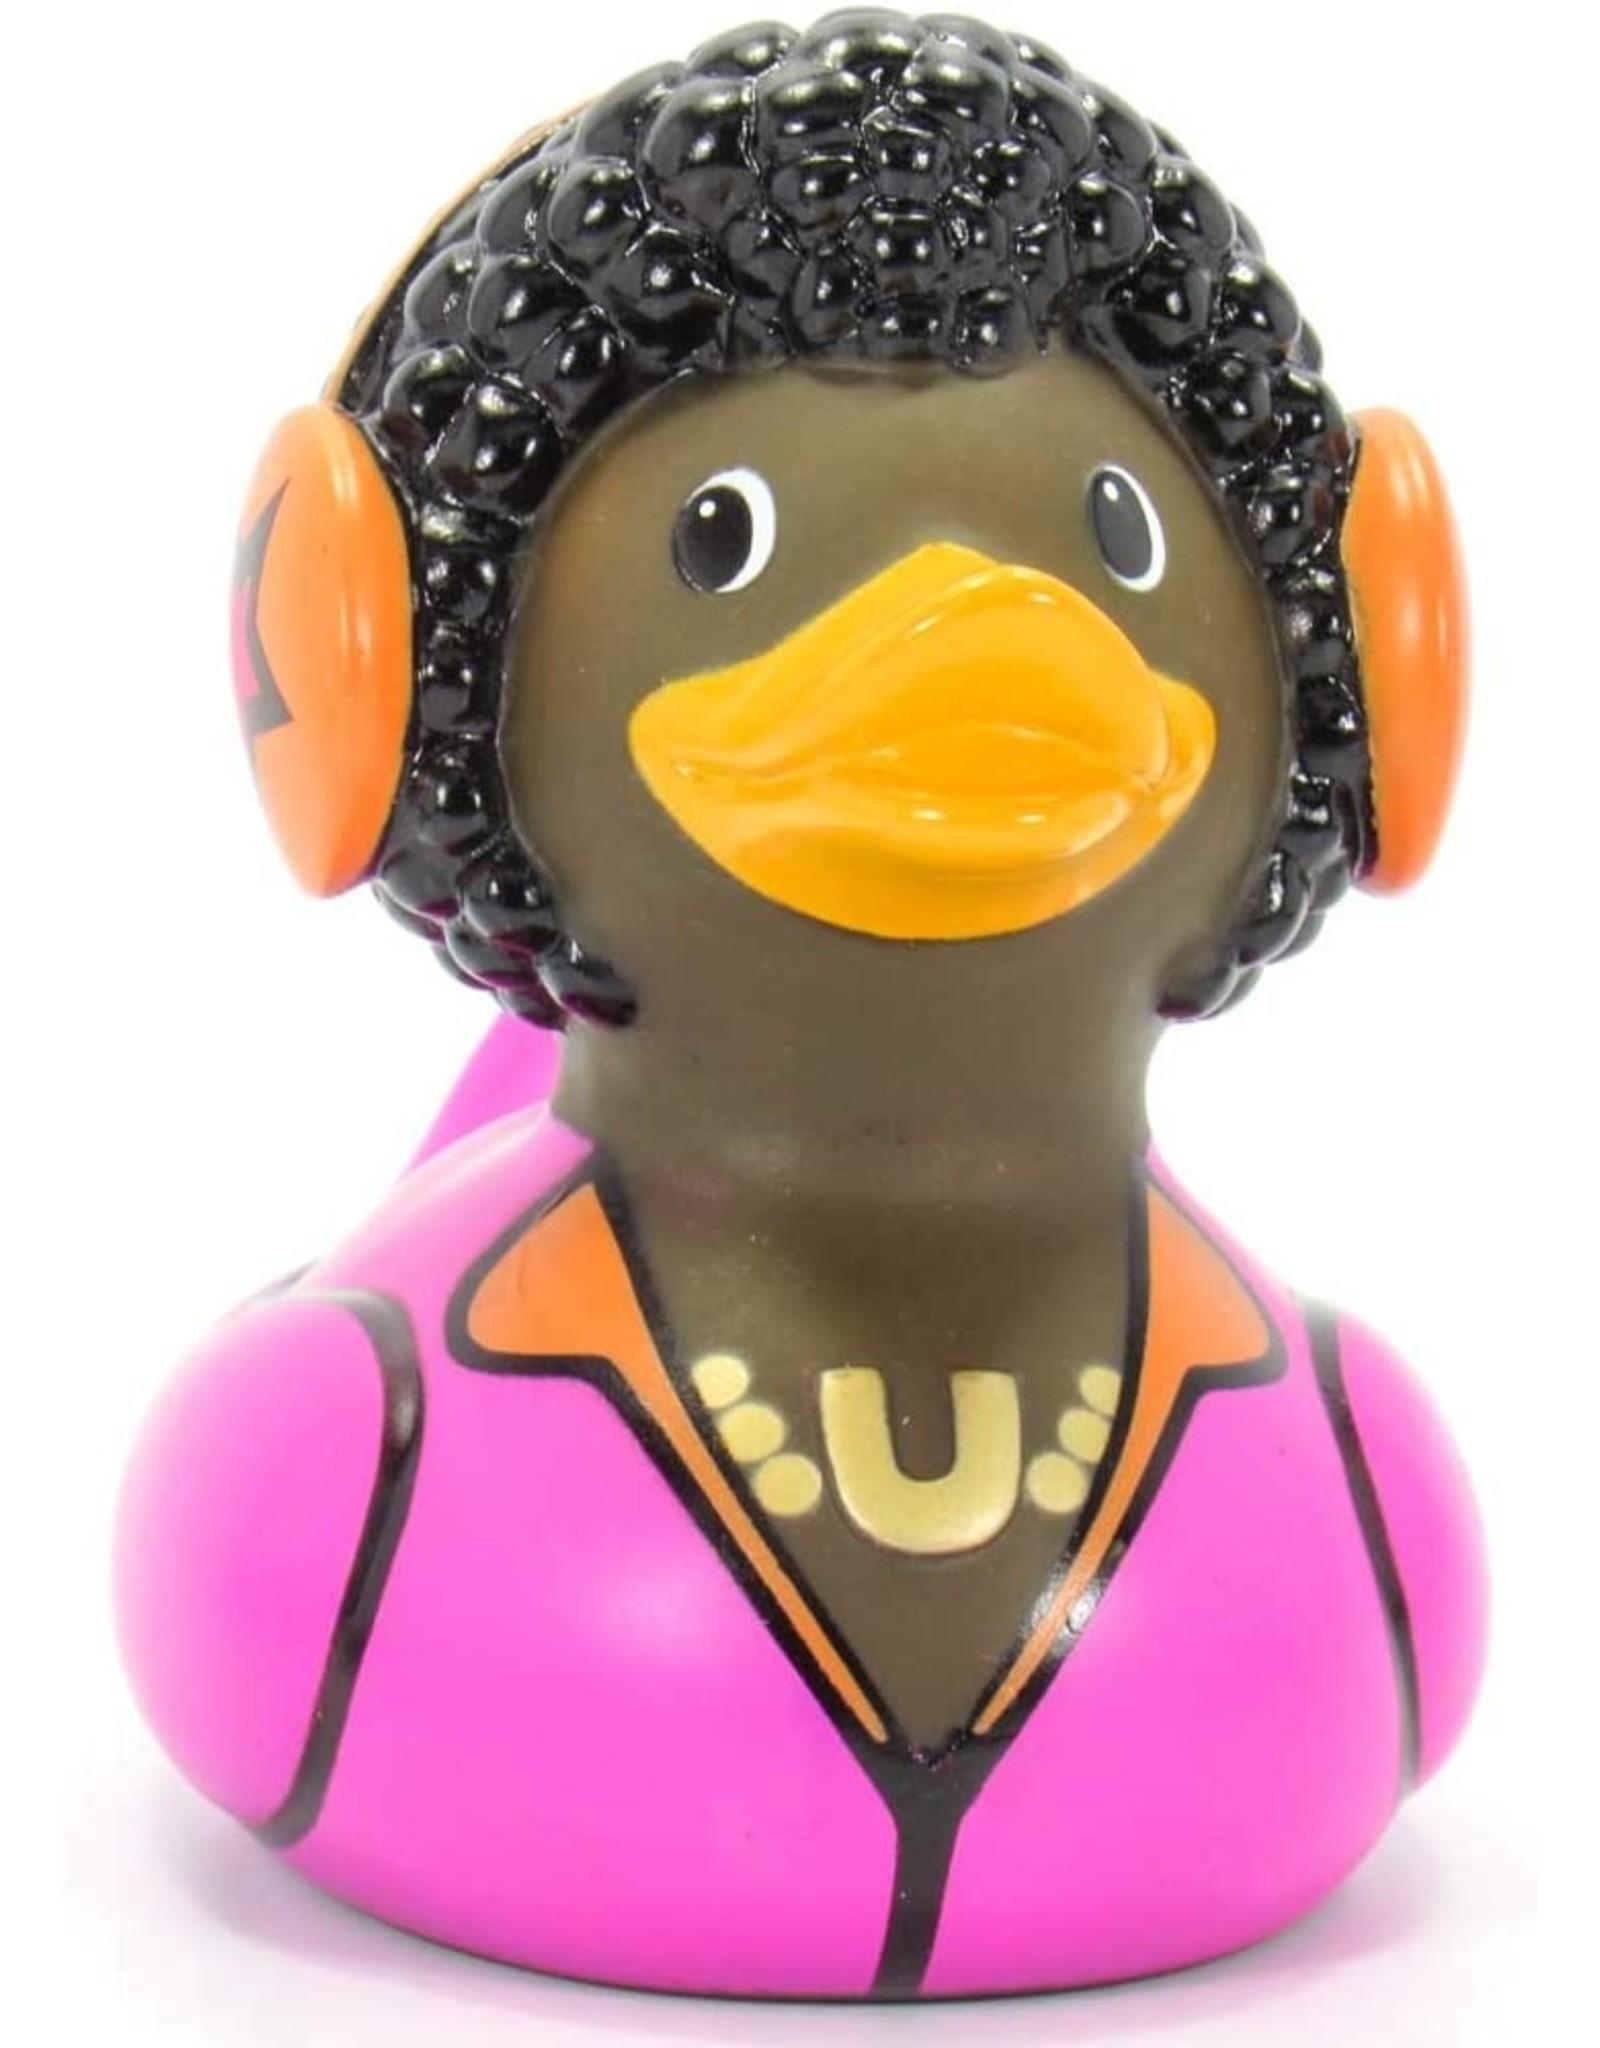 DJ Rubber Duck